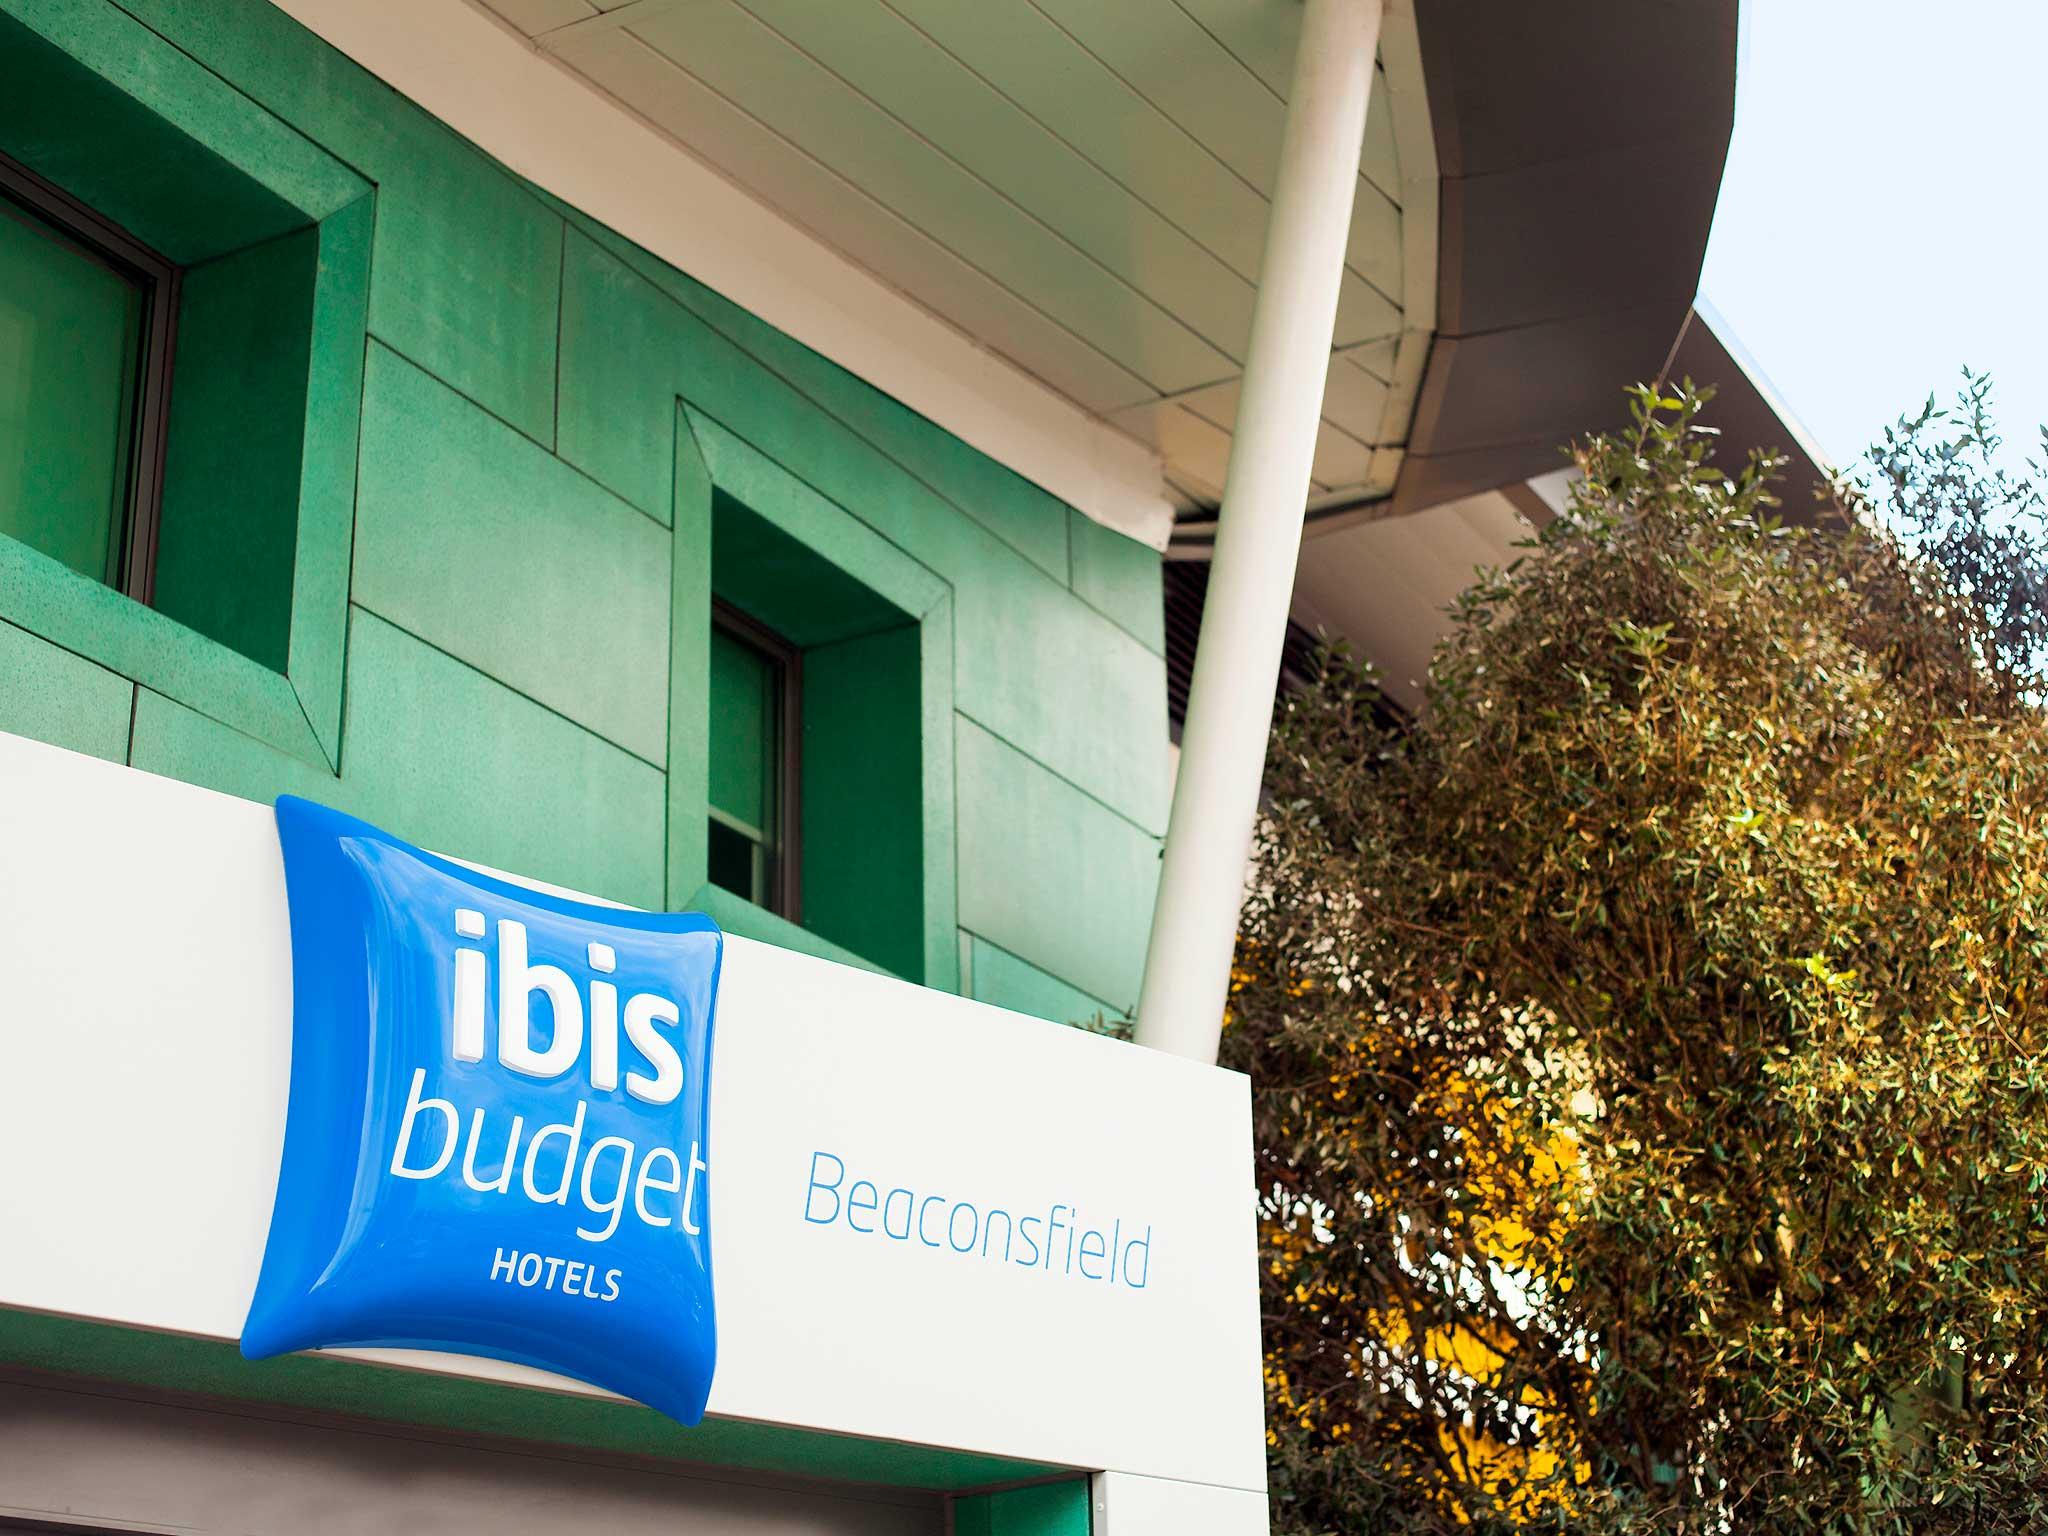 Hotel - ibis budget Beaconsfield